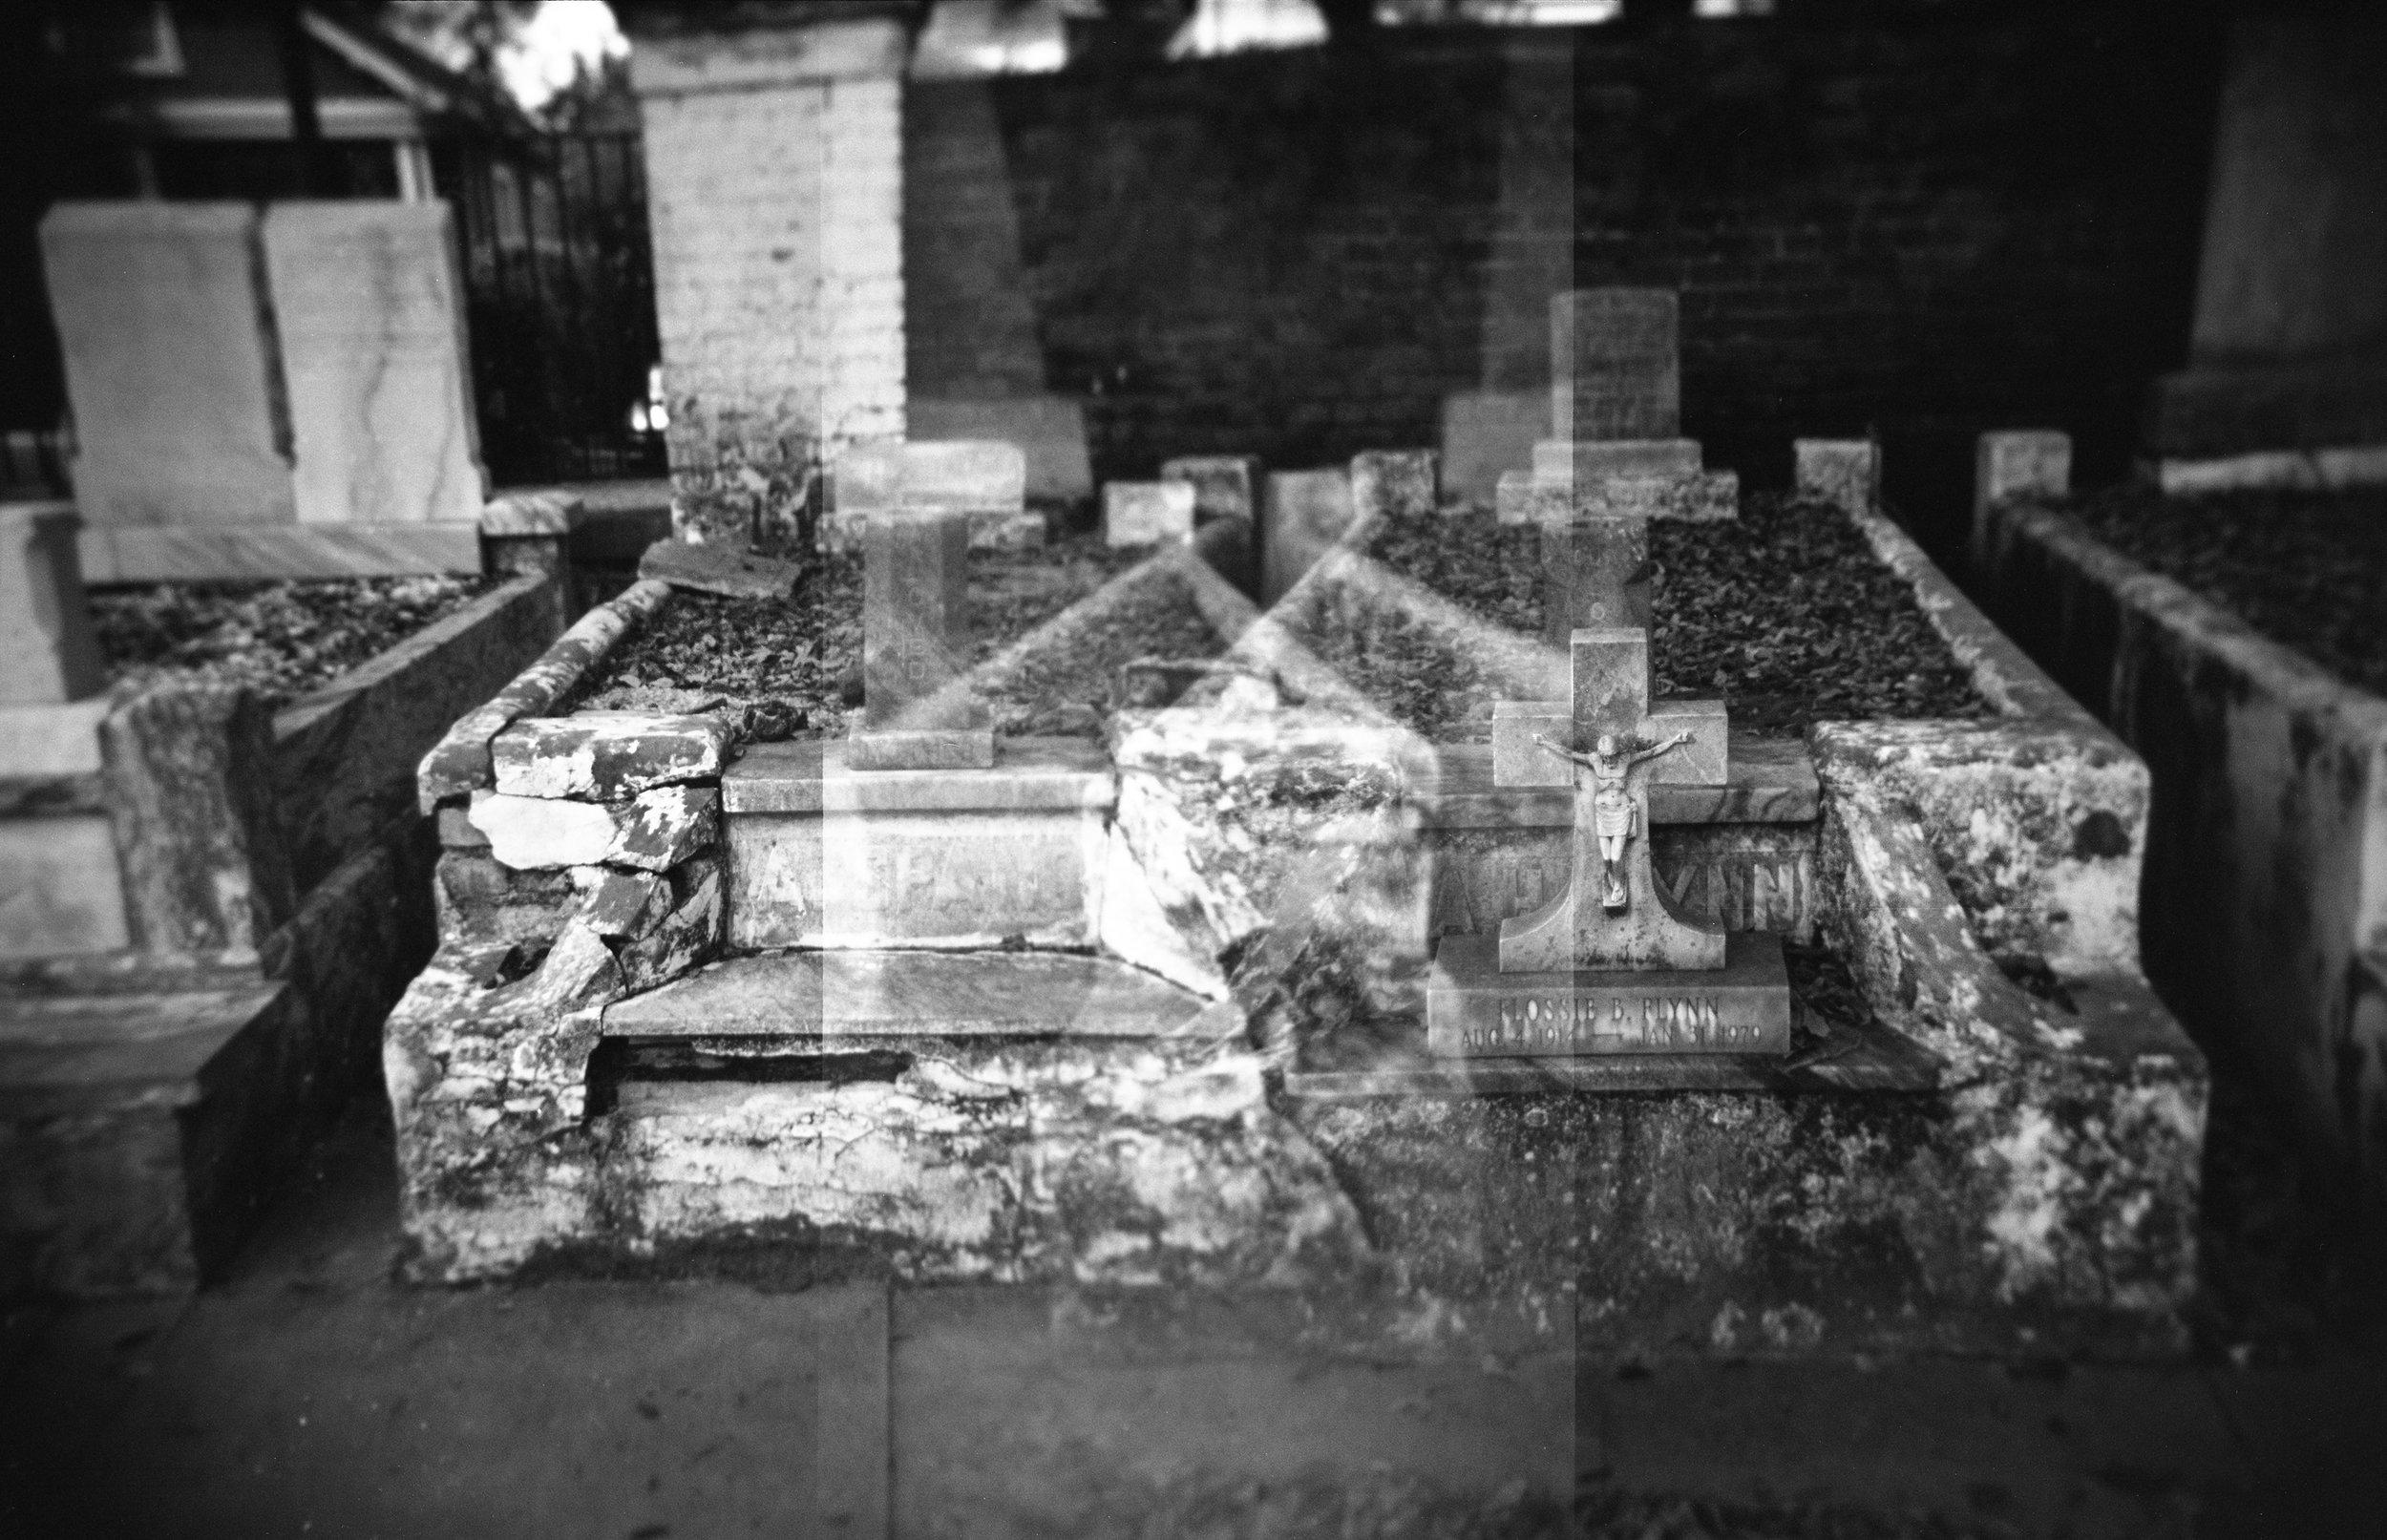 Burial & Crucifix, Double Exposure